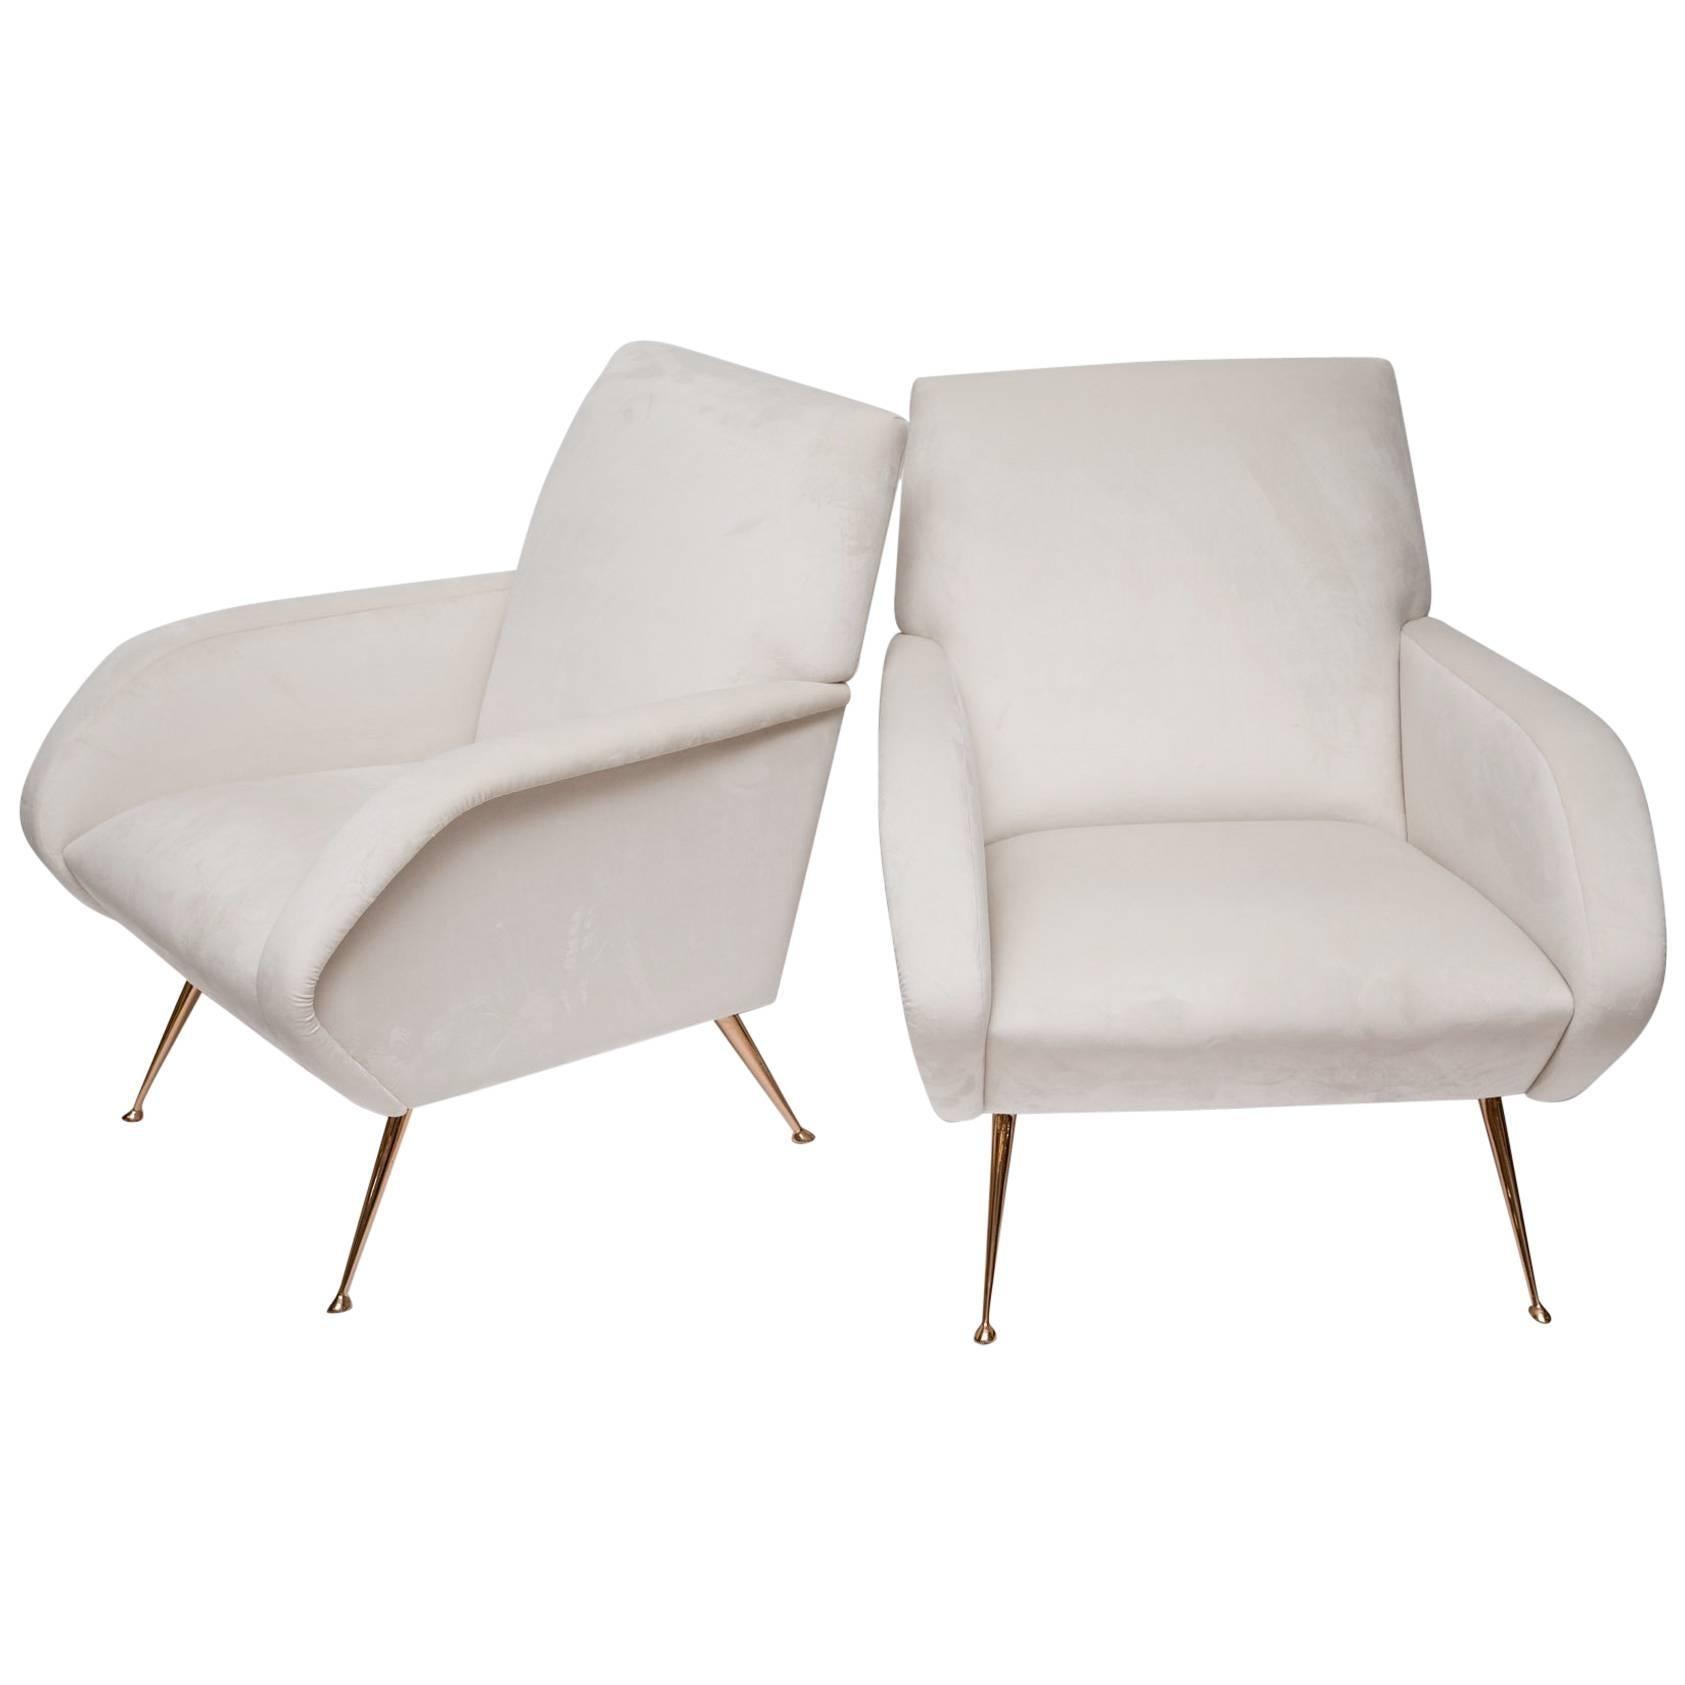 Stripe's Own Custom Roma Chairs